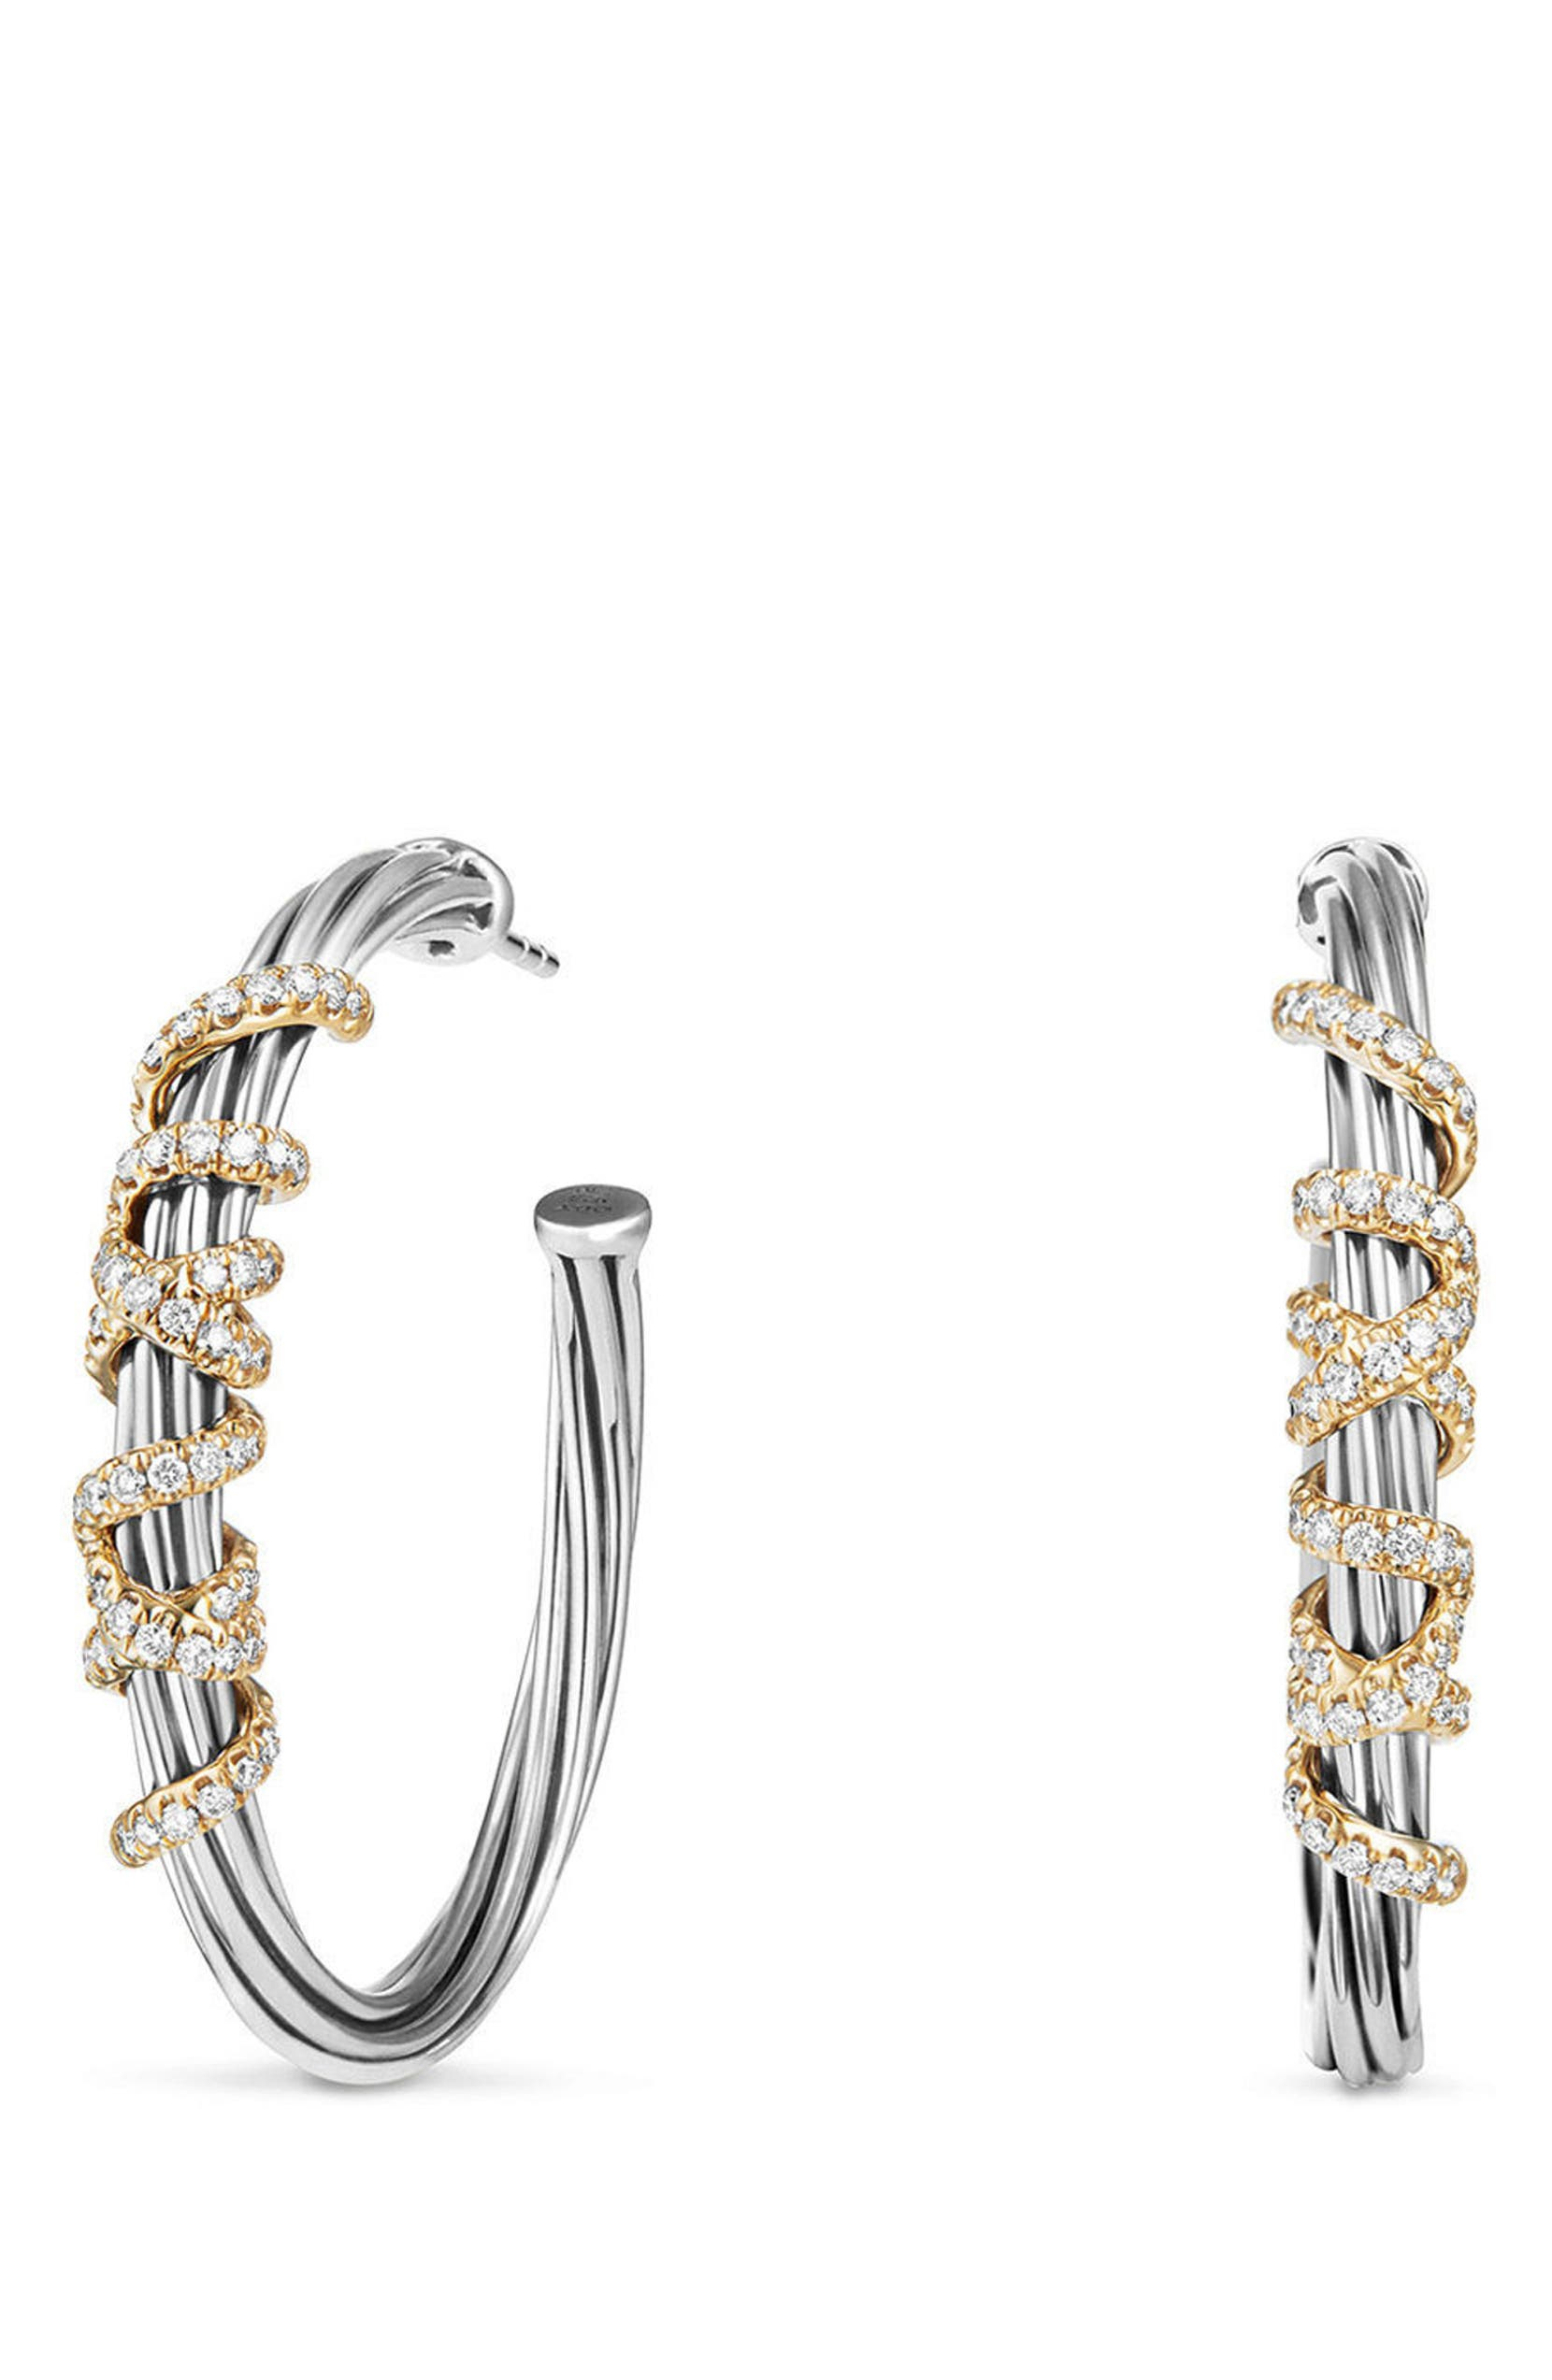 c71c44077c97d David Yurman Helena Large Hoop Earrings with Diamonds & 18K Gold ...